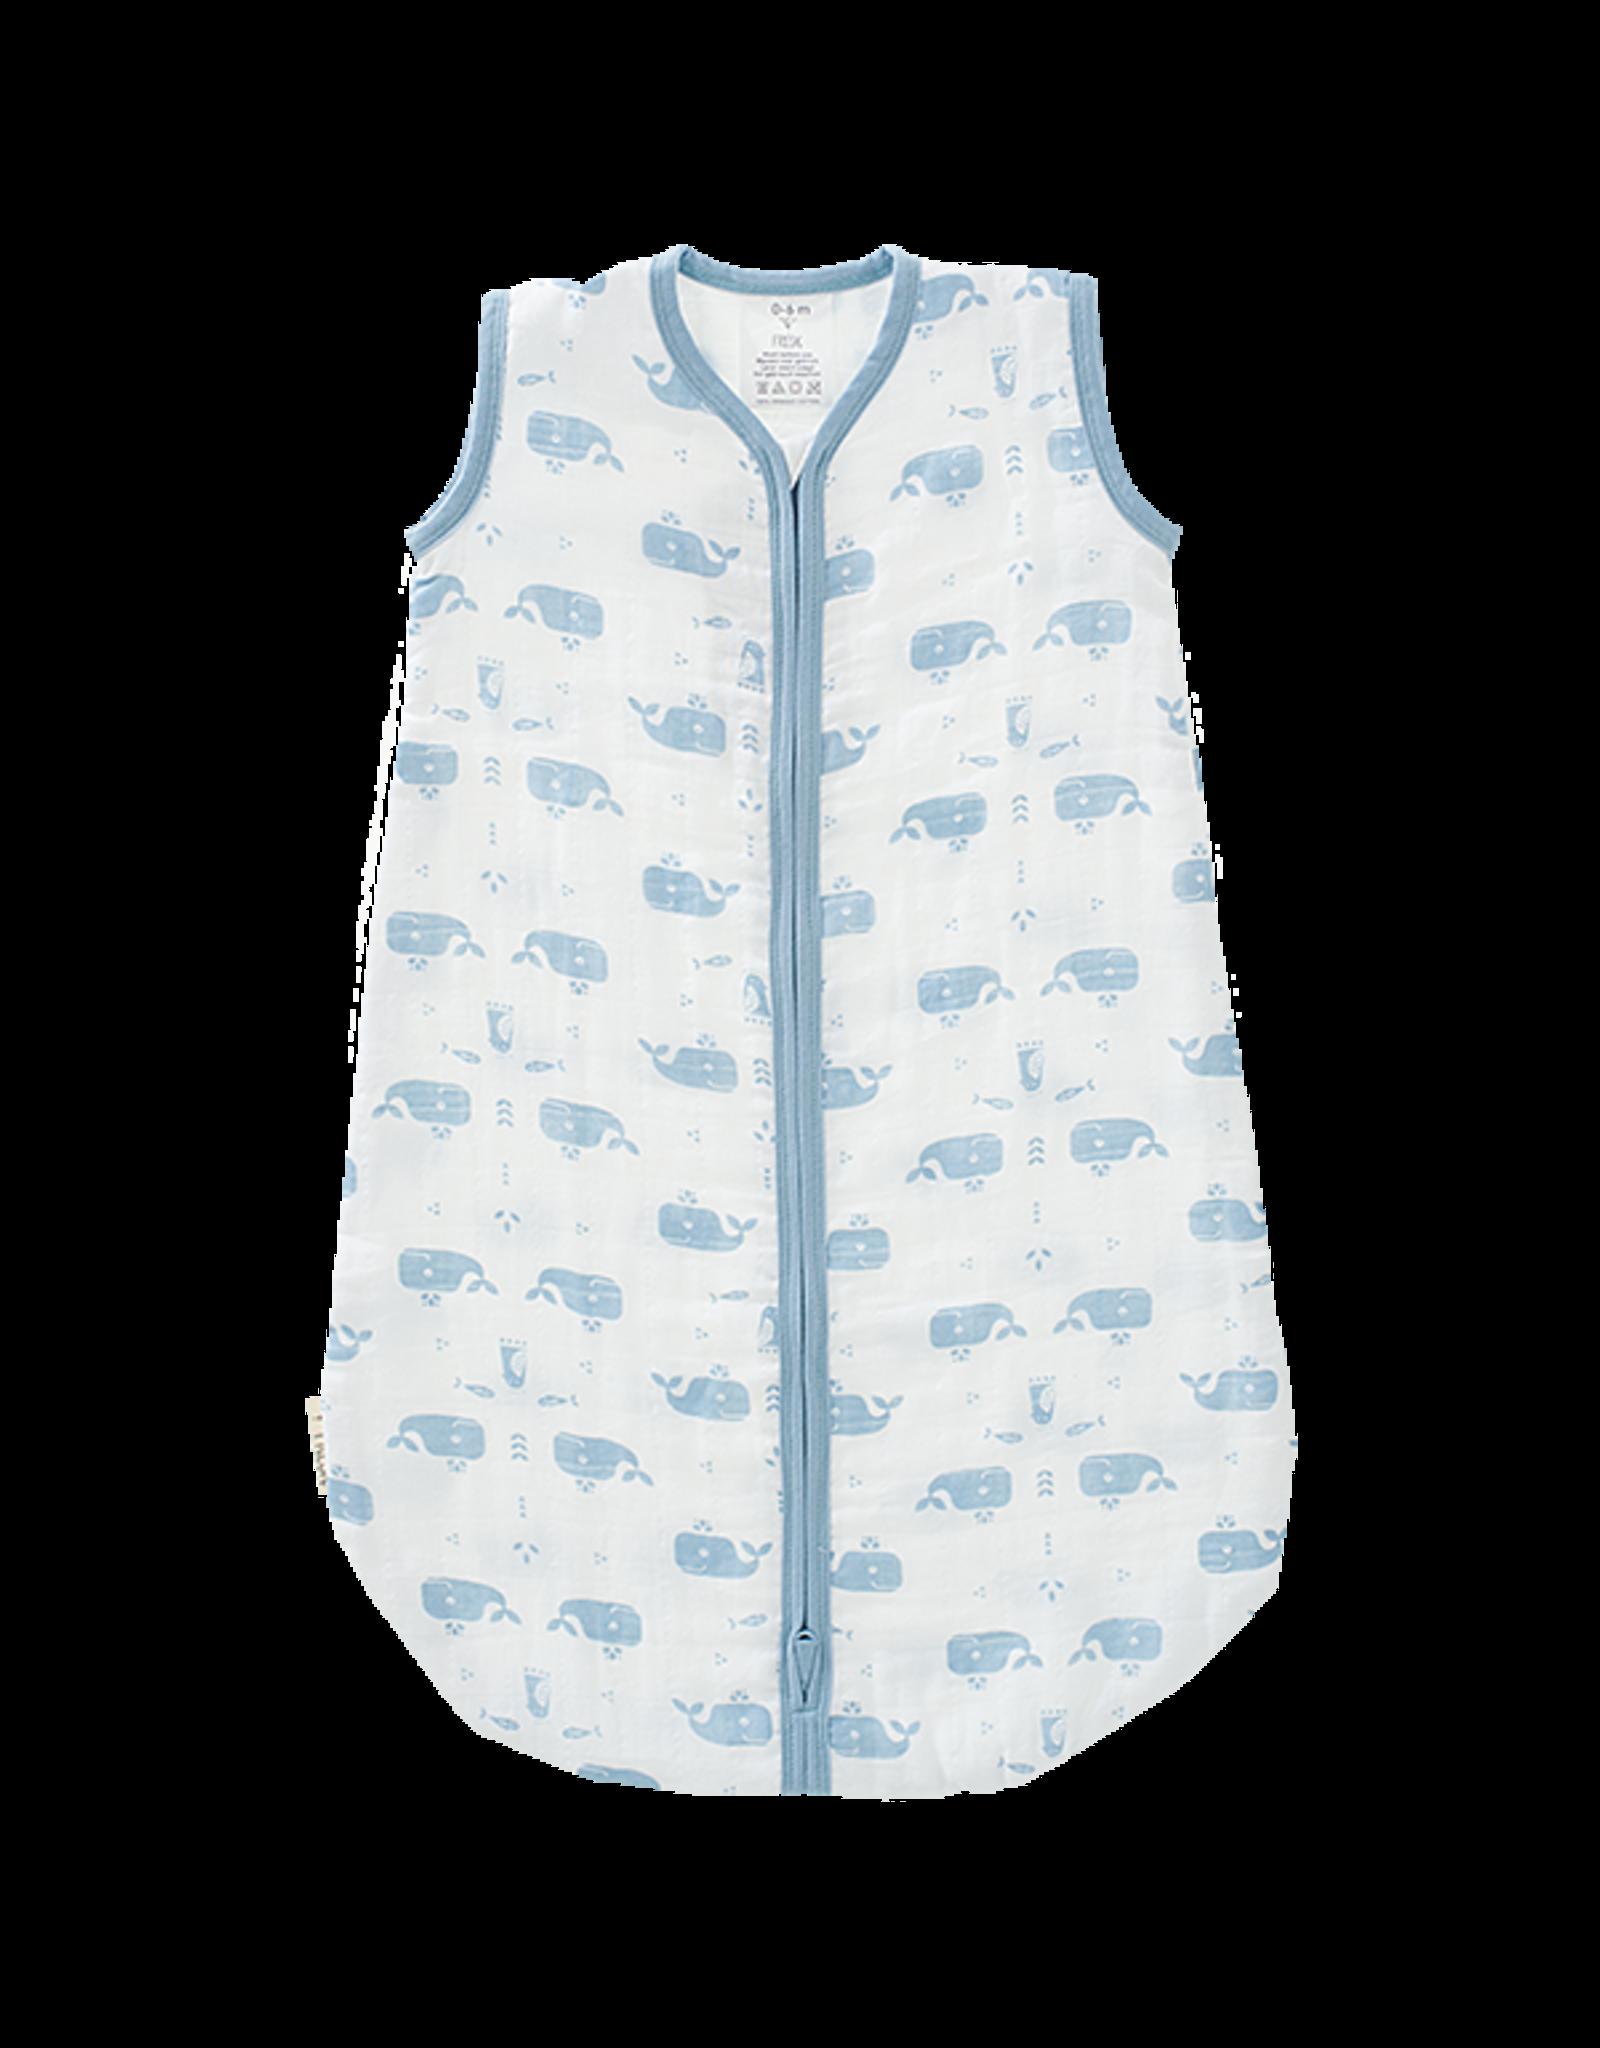 Fresk Fresk Zomerslaapzak Mouwloos Muslin-katoen Wit met Blauw Walvis